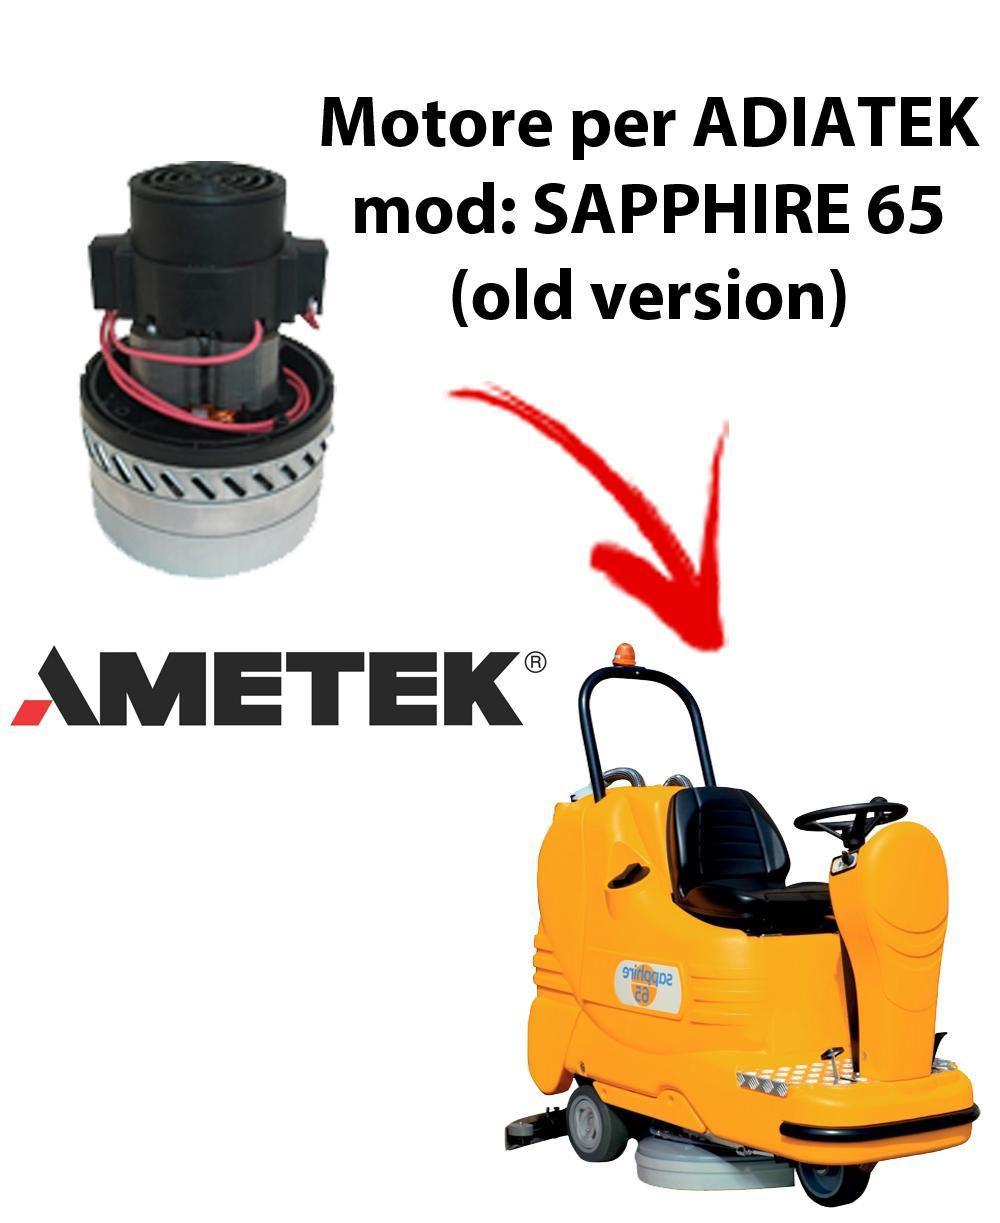 Sapphire 65 (old version) Motore de aspiración Ametek Italia  para fregadora Adiatek